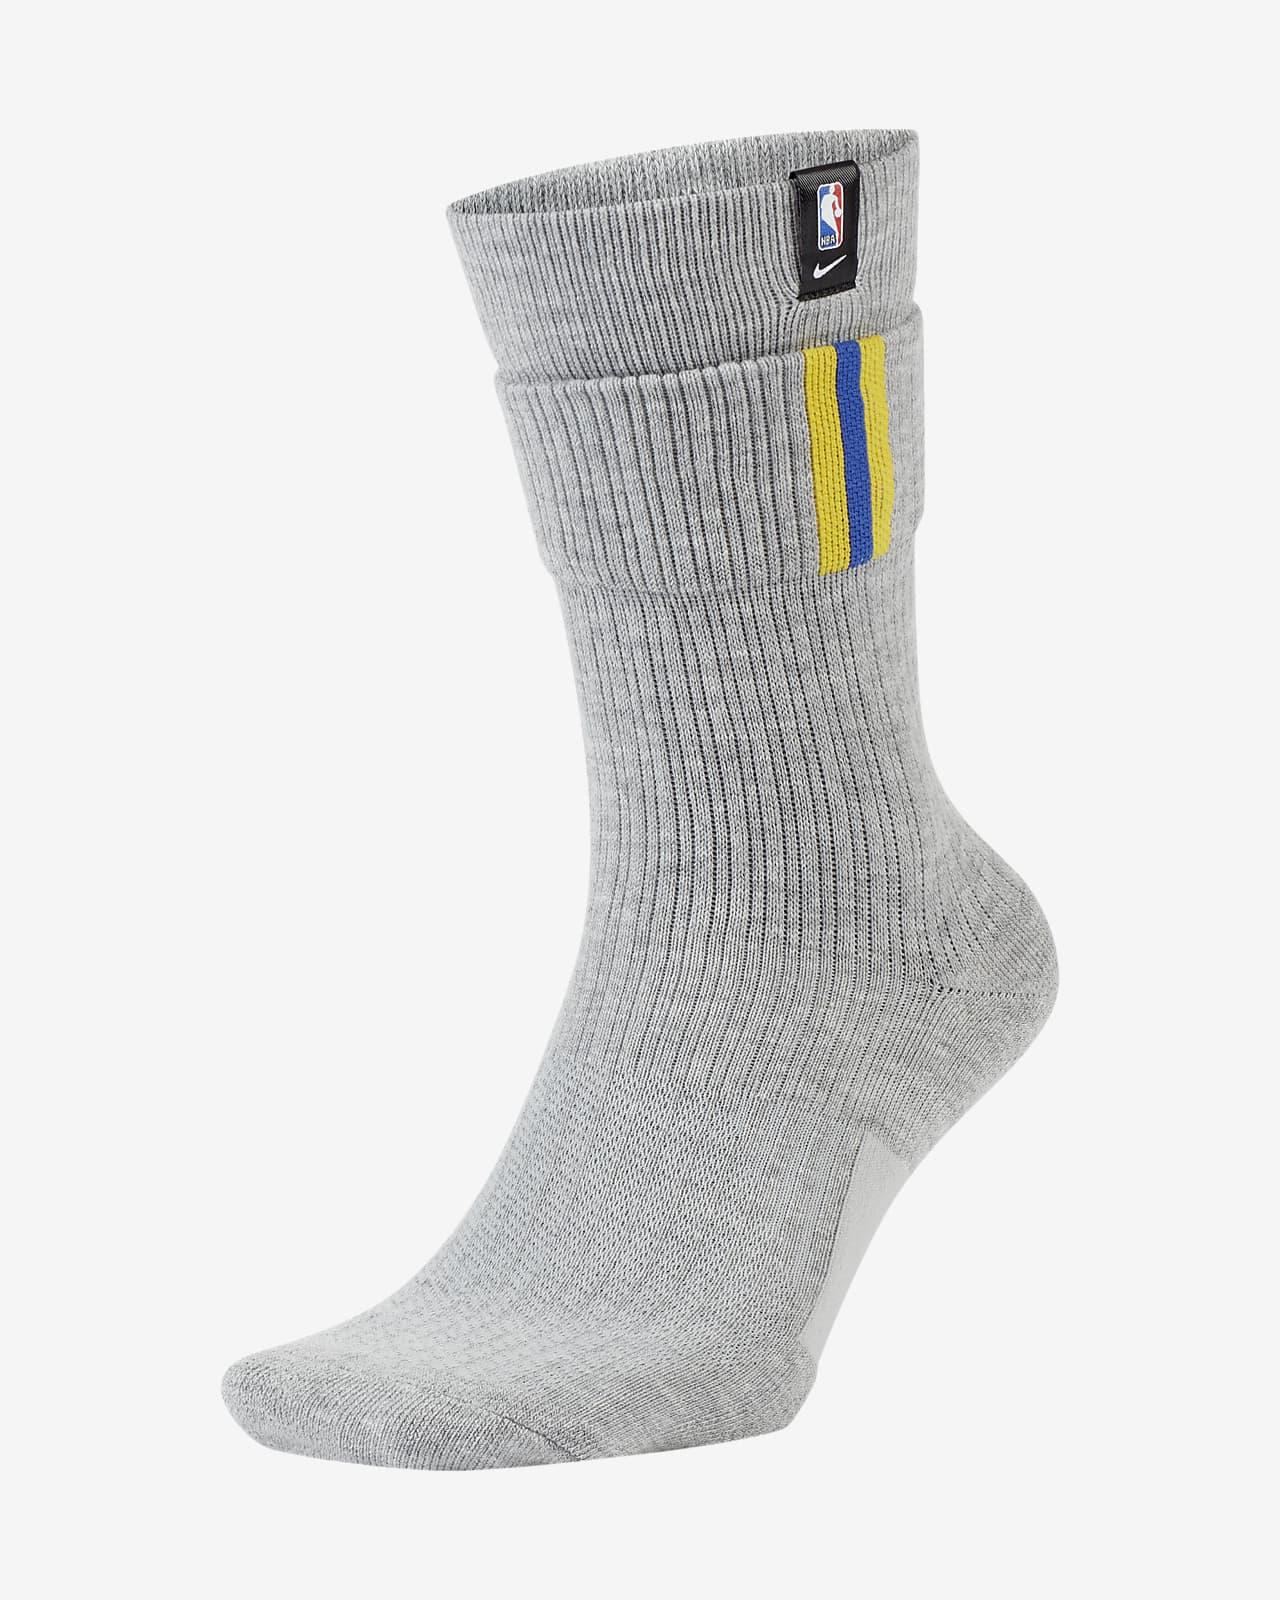 Golden State Warriors Courtside Nike NBA Crew Socks